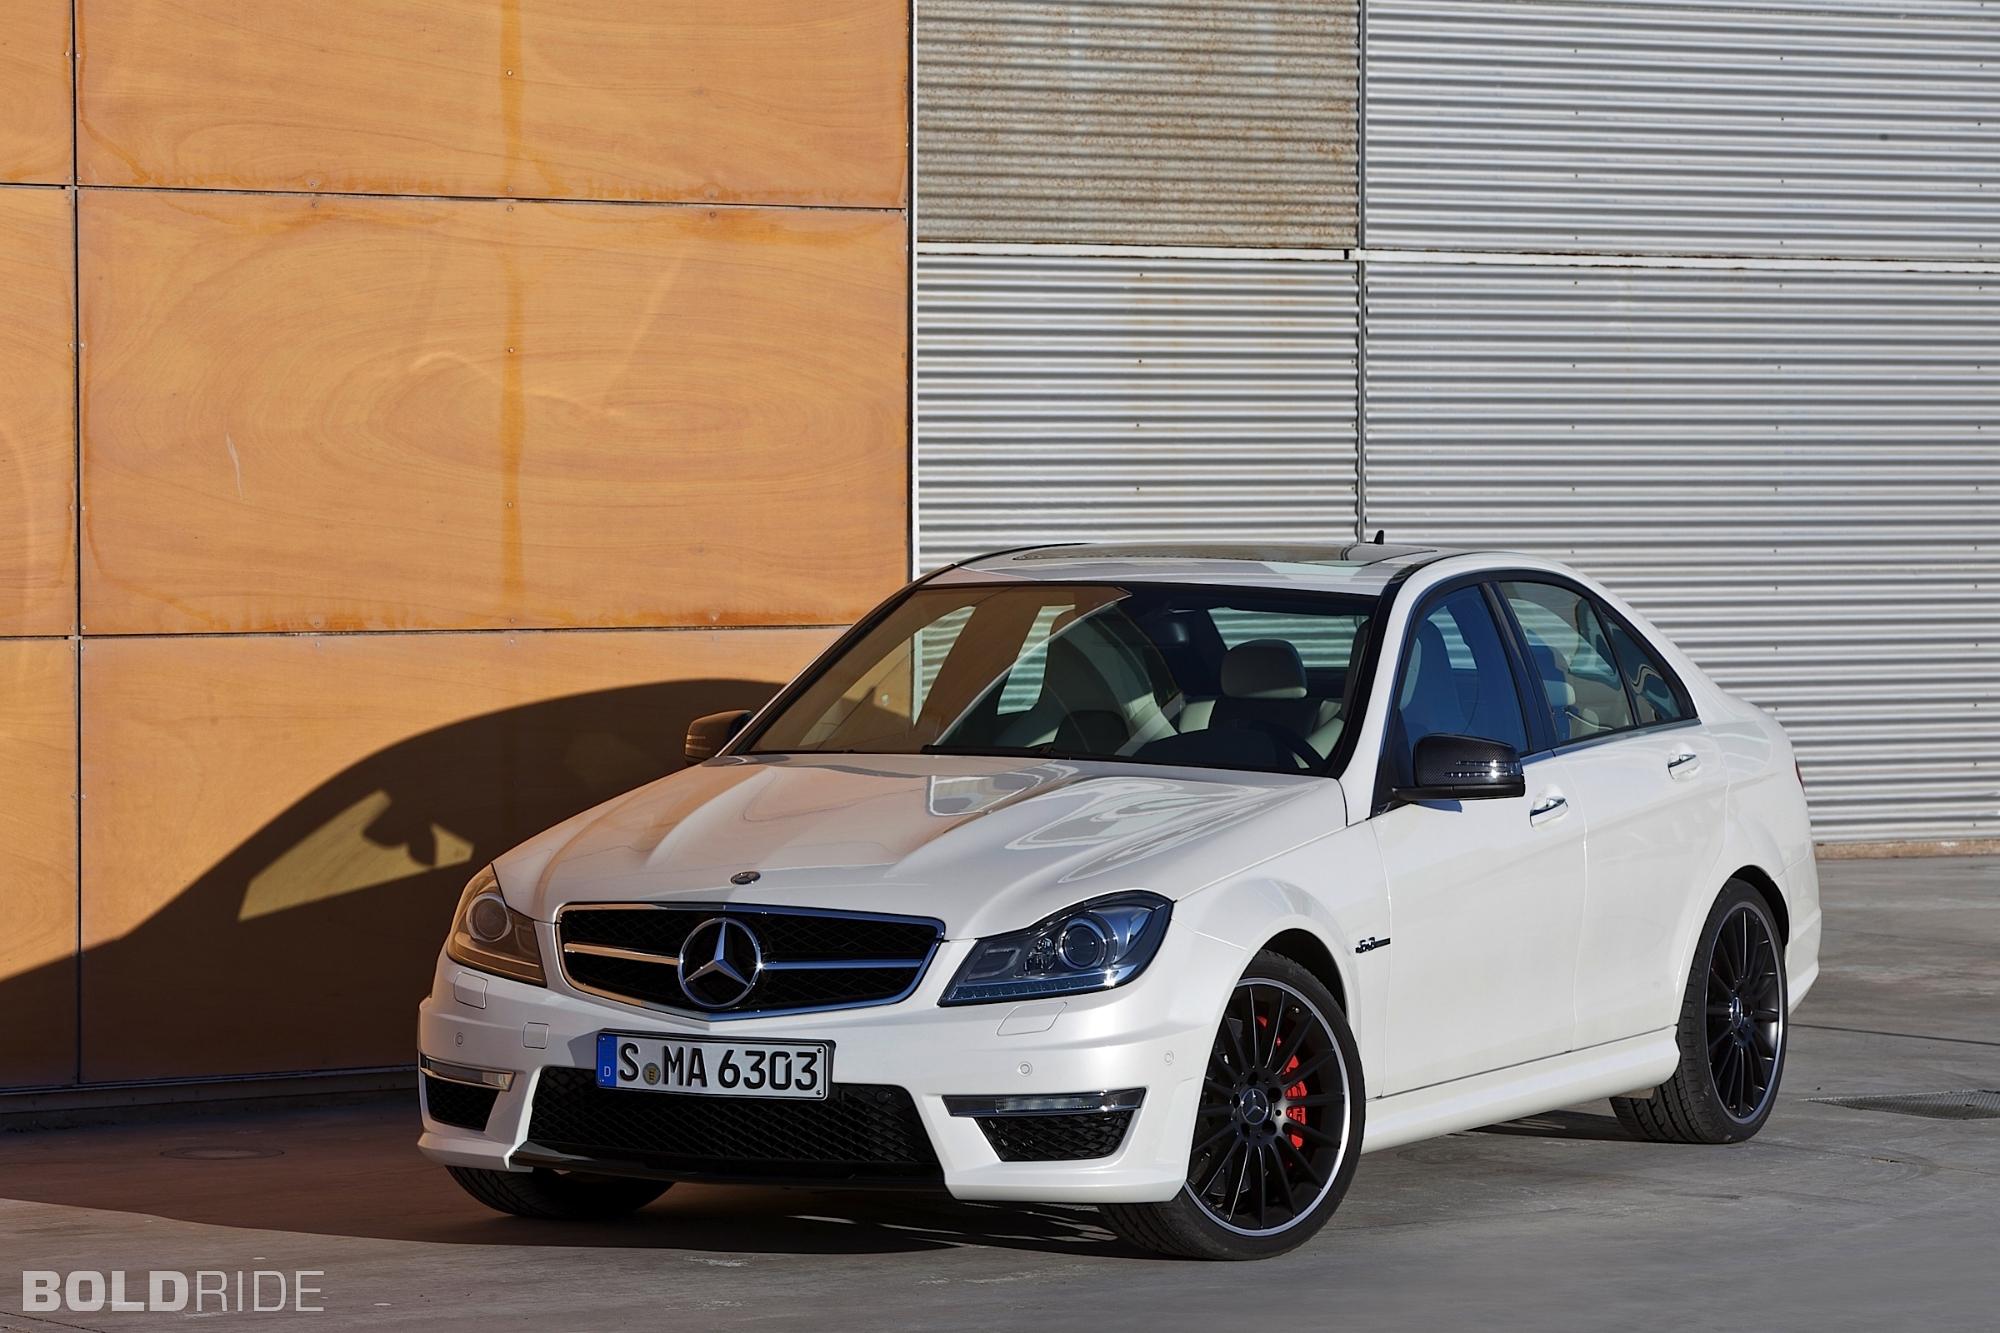 2012 Mercedes-Benz C63 AMG Sedan 2000 x 1333